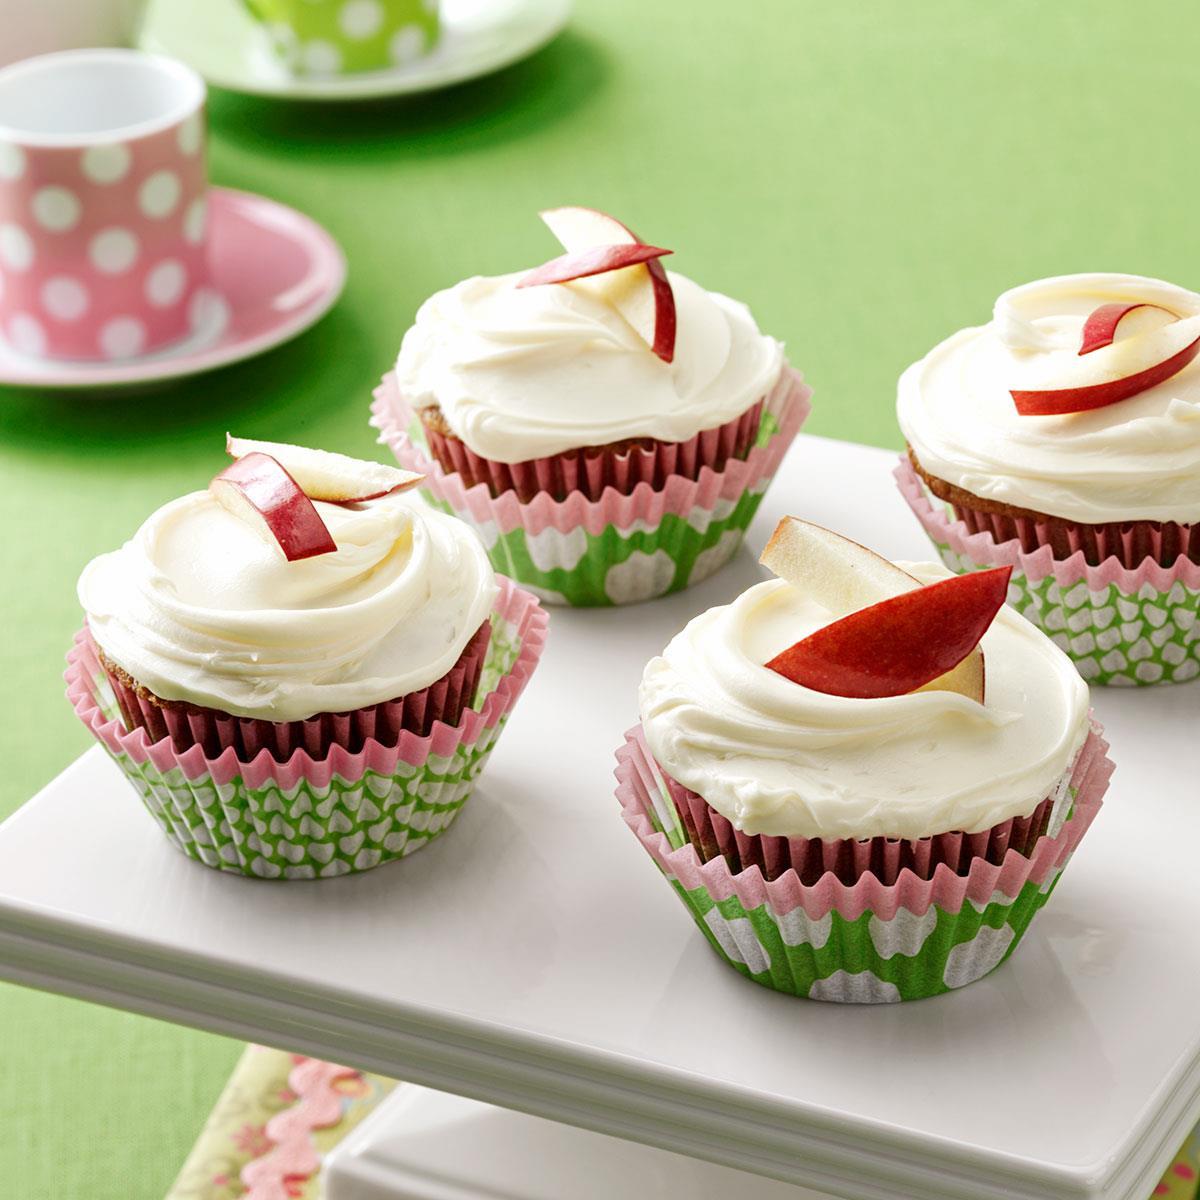 Applesauce Spice Cupcakes Recipe Taste of Home